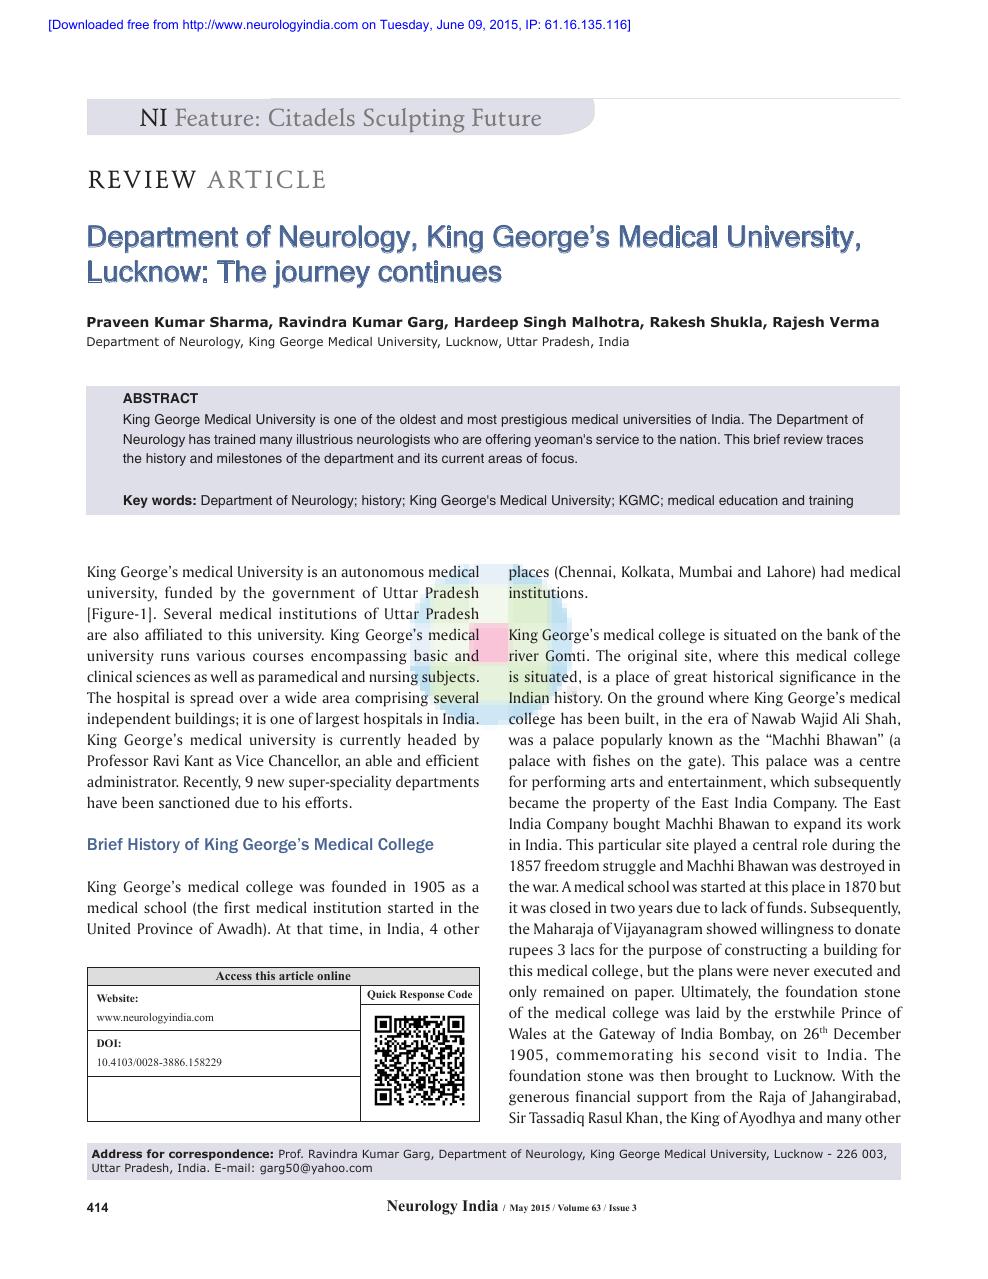 kgmc thesis topics